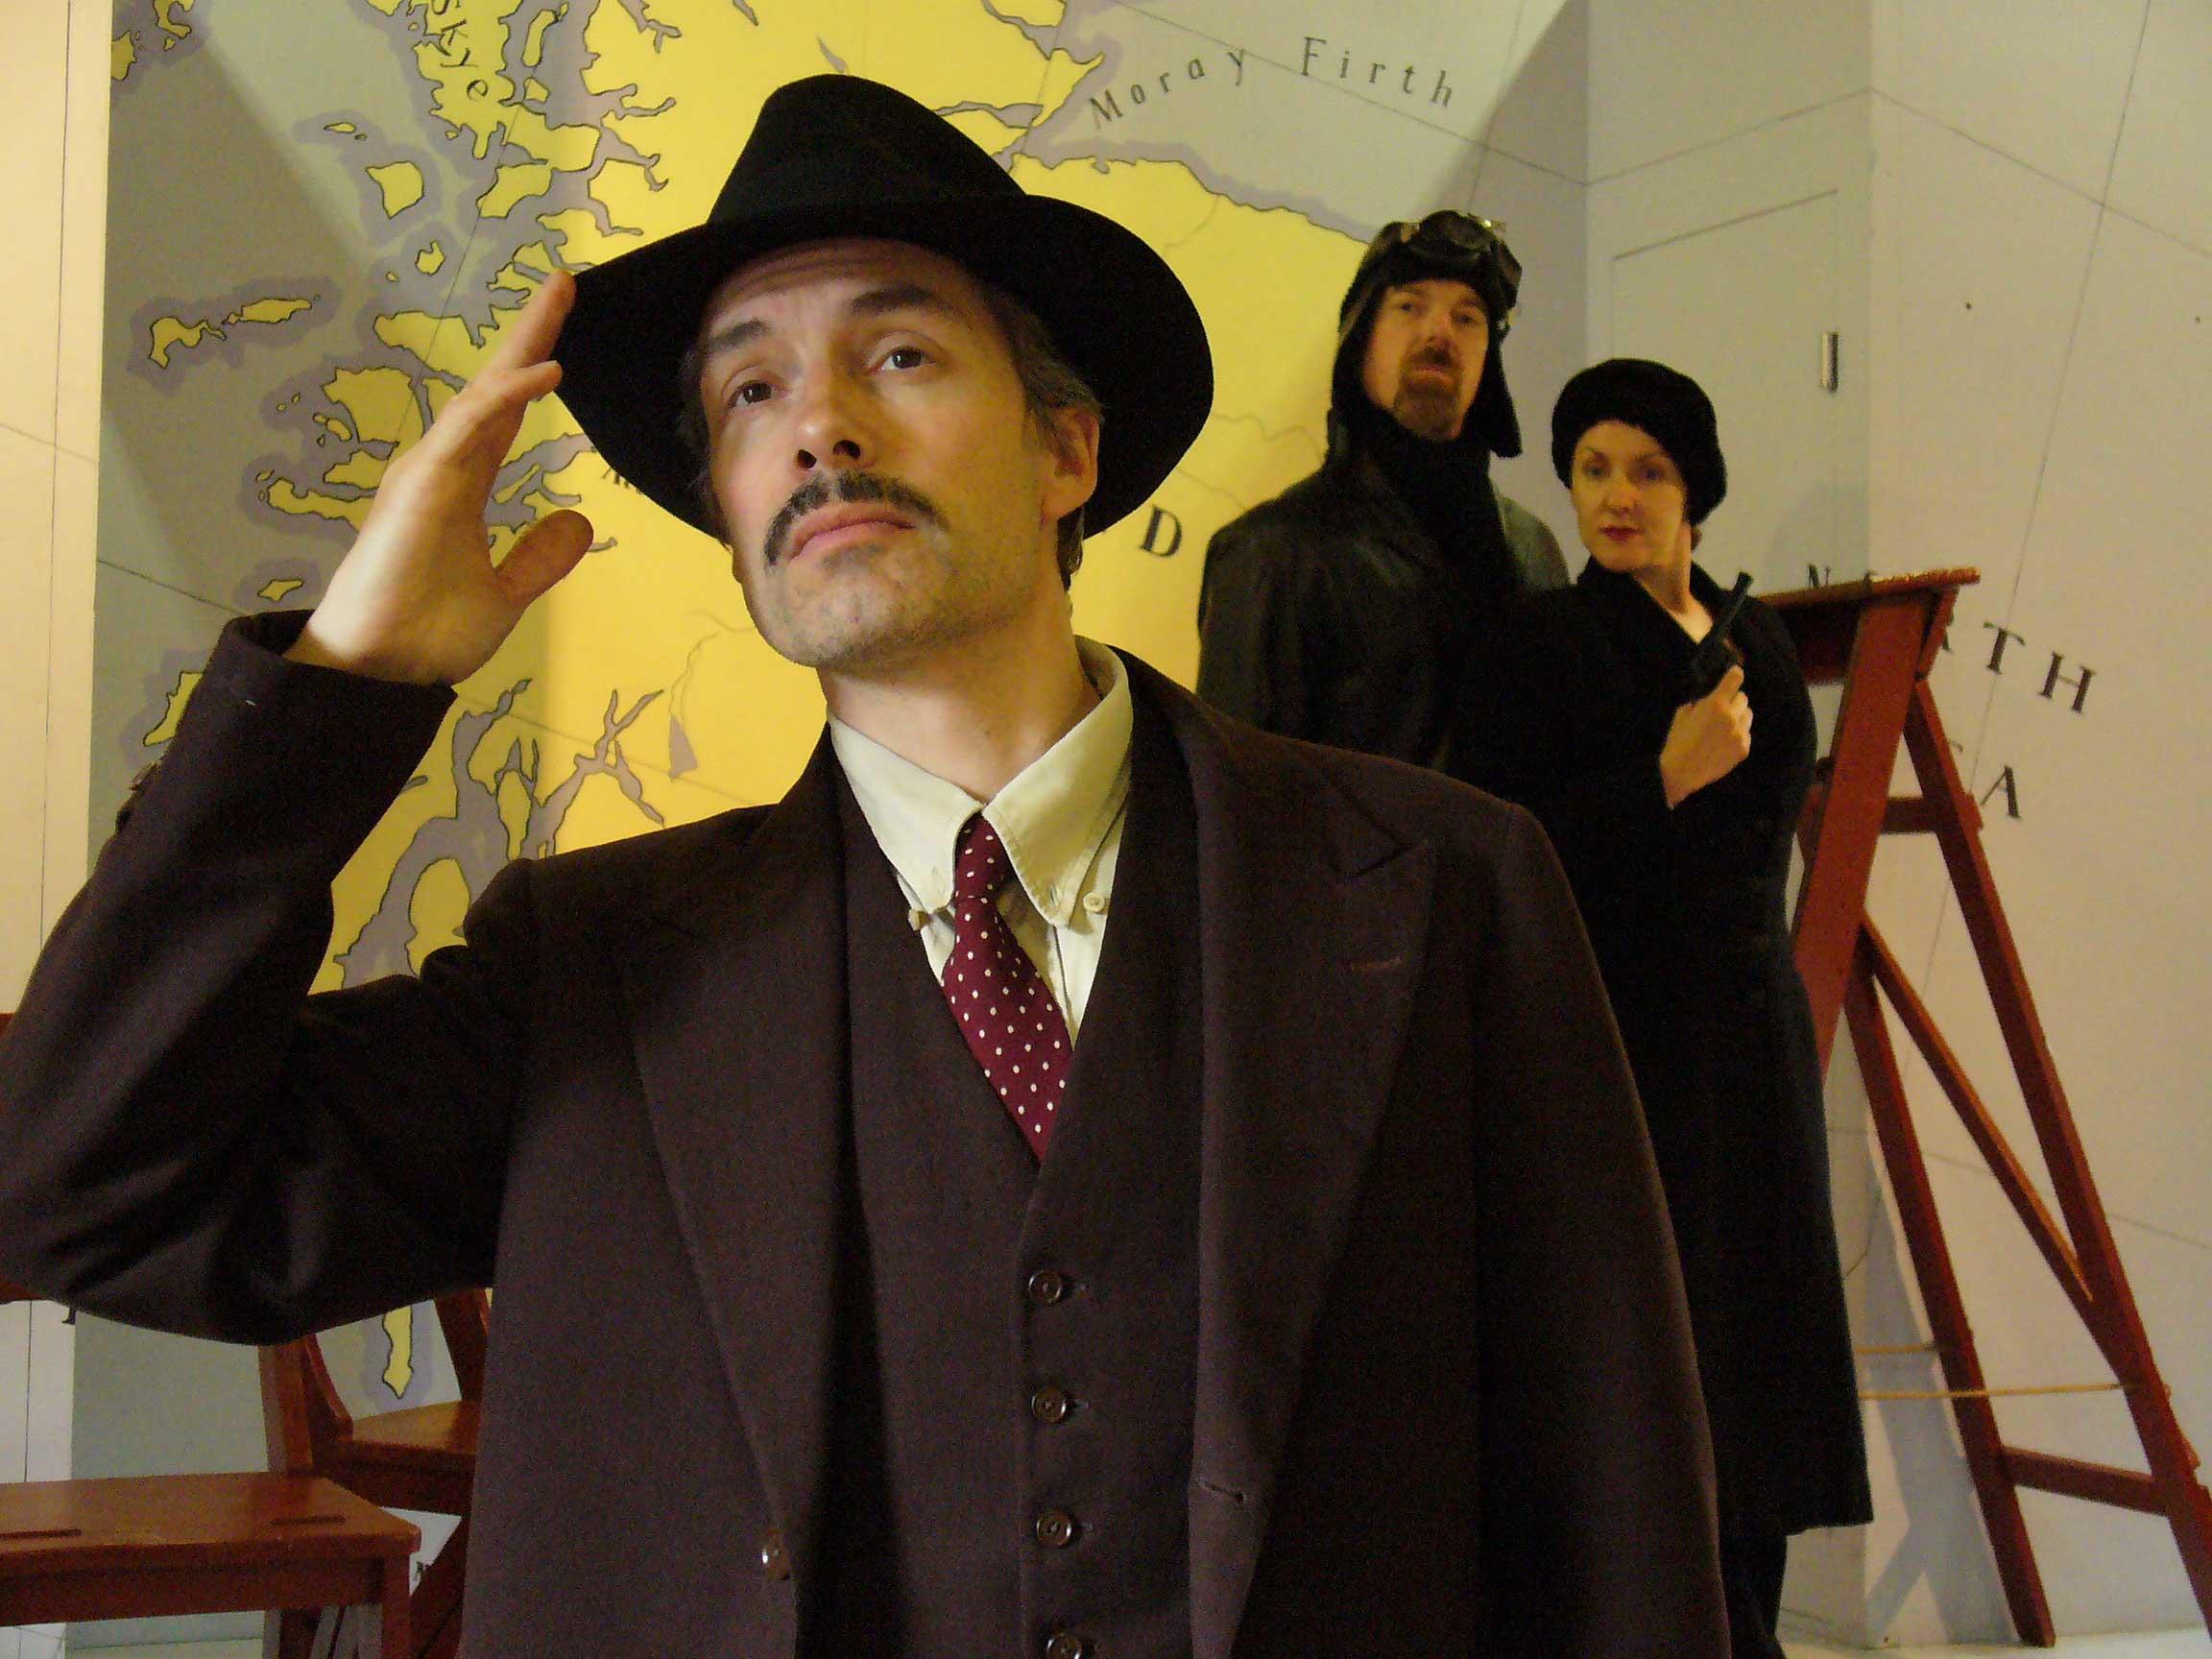 Thomas Frere - Richard Hannay, The 39 Steps, original production